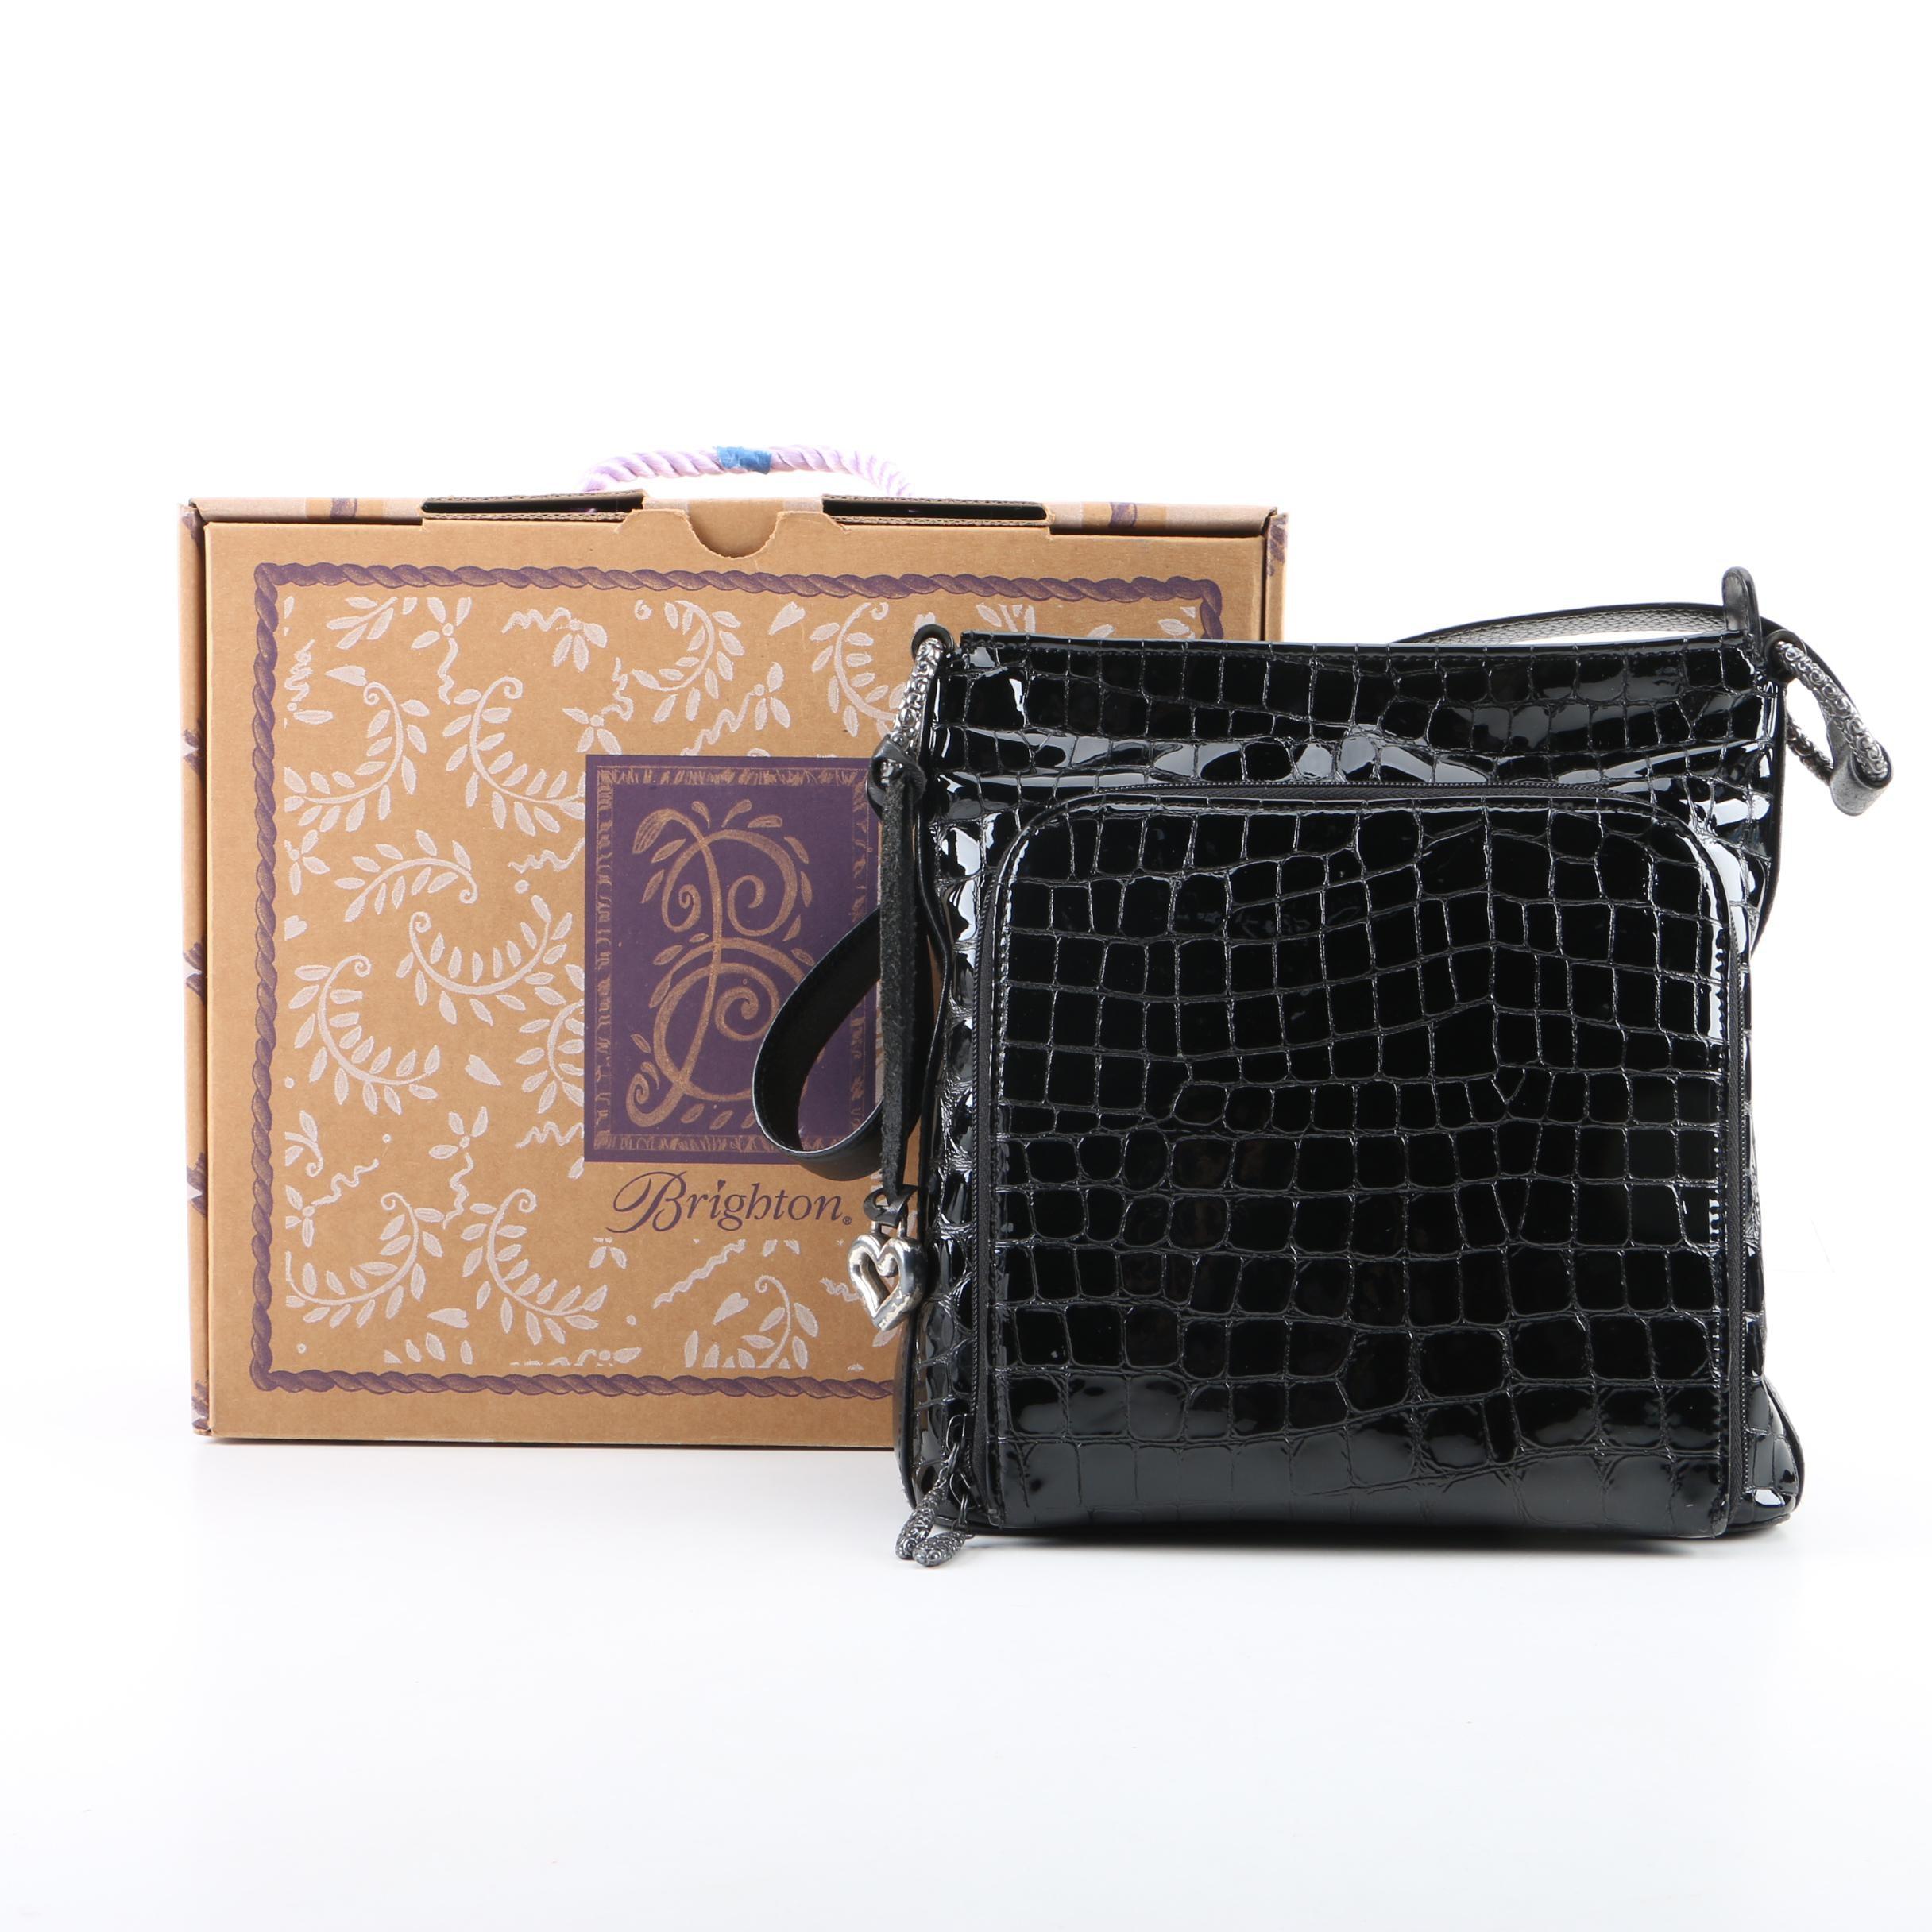 Brighton Embossed Black Patent Leather Shoulder Bag